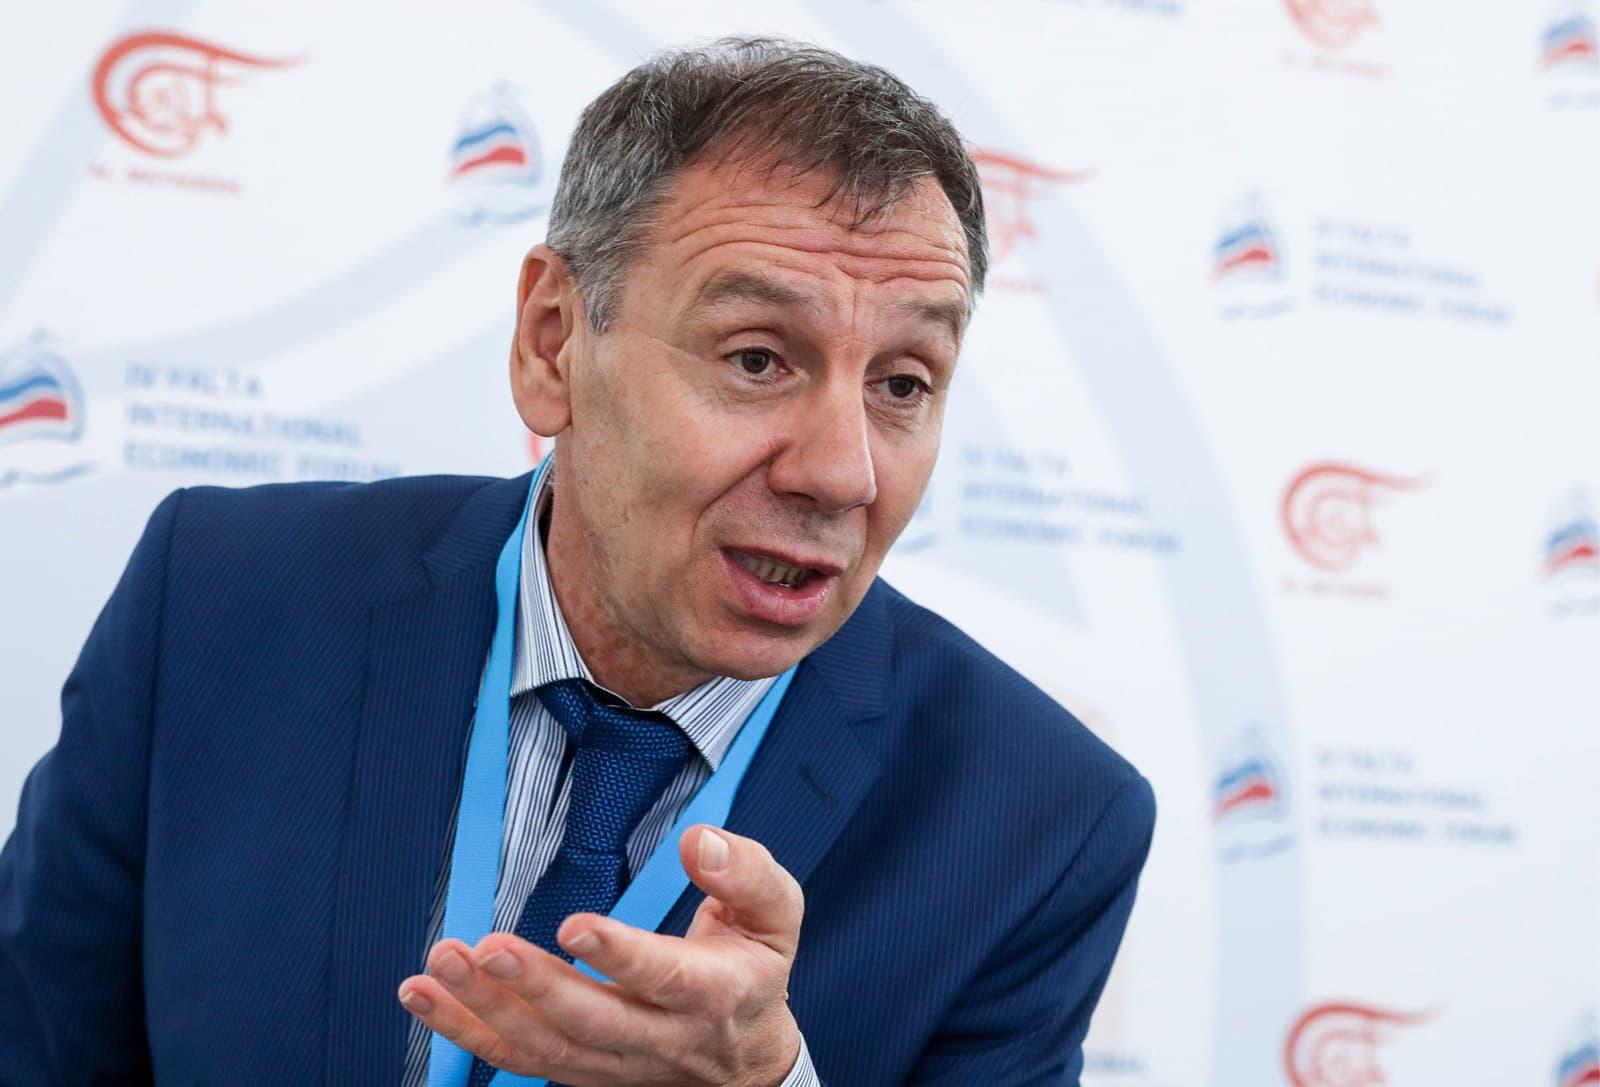 L'exdiputat rus Serguéi Markov l'abril del 2018. Fotografia de Vyacheslav Prokofyev. TASS. Getty Images